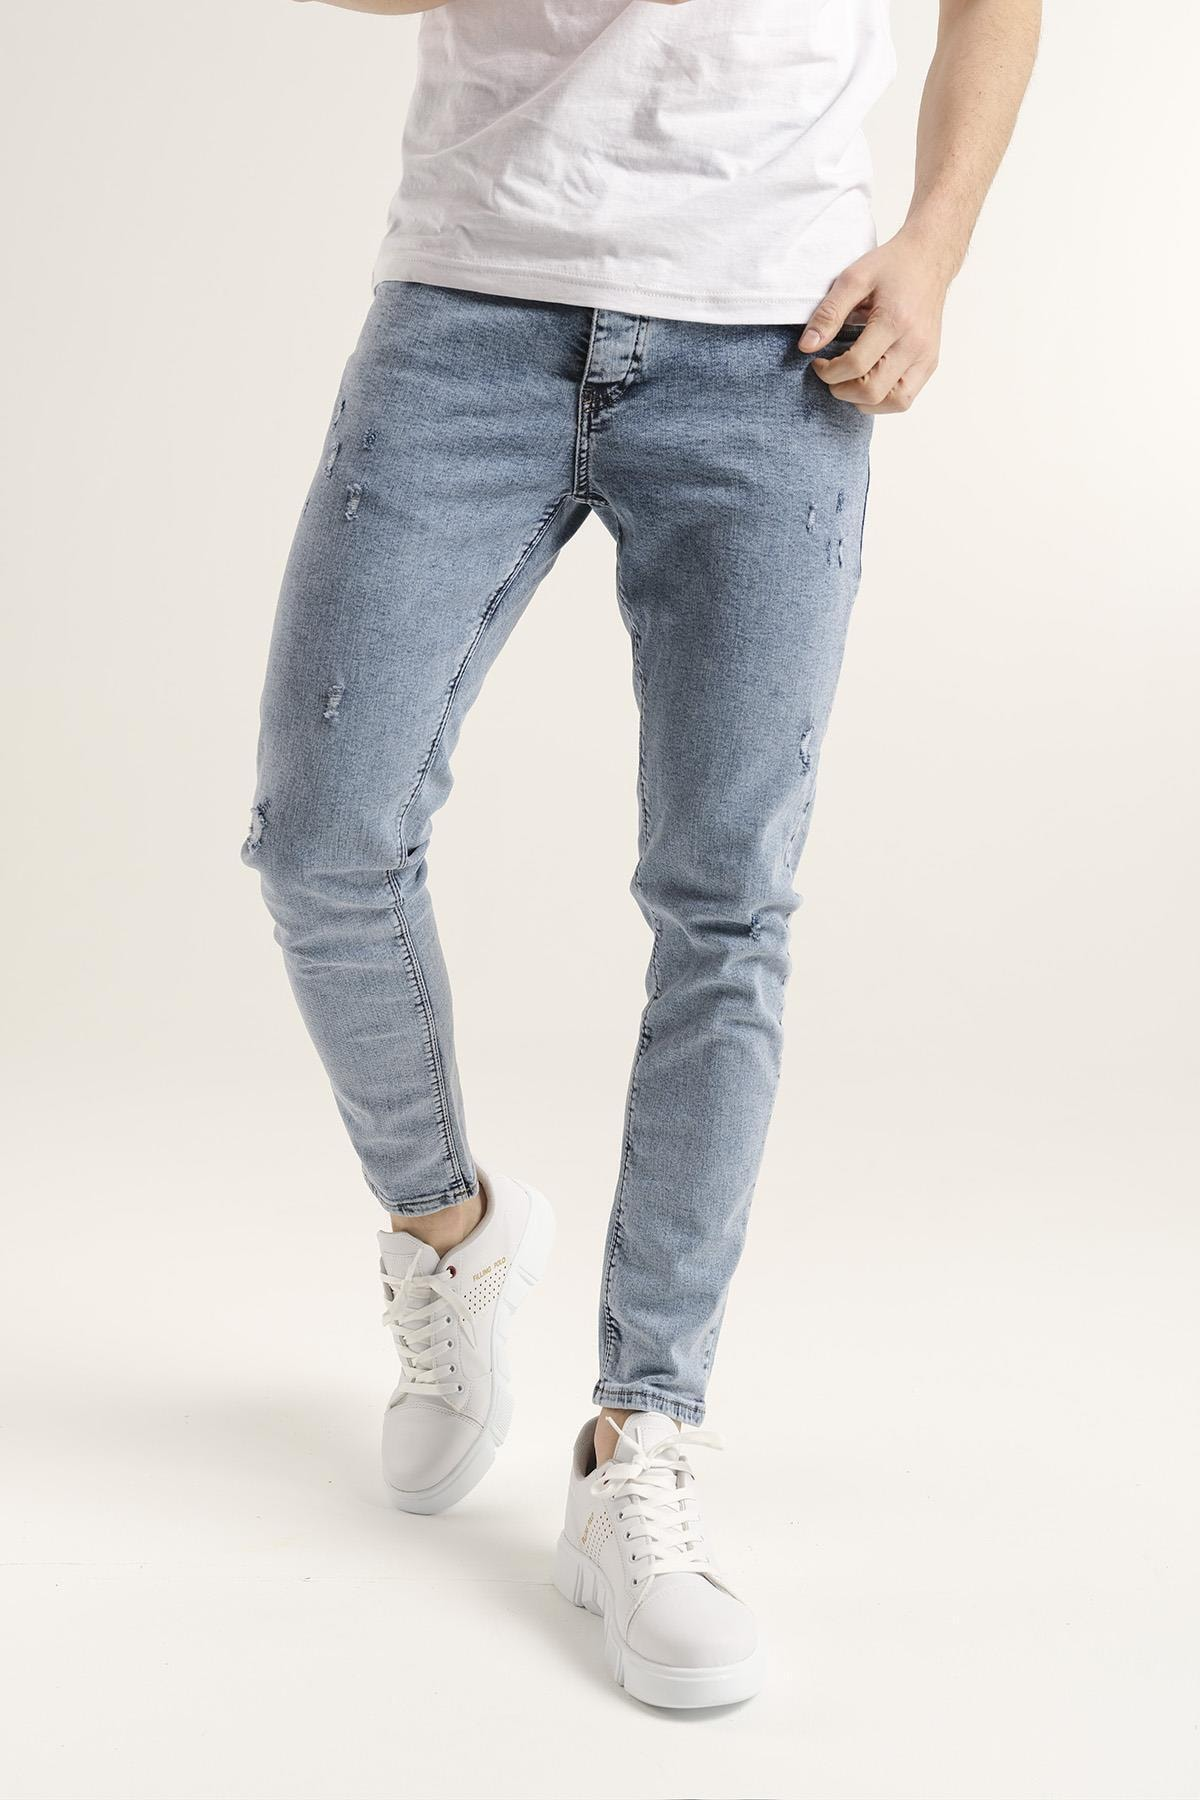 Reax 301 Slim Fit Likralı Erkek Jean Pantolon